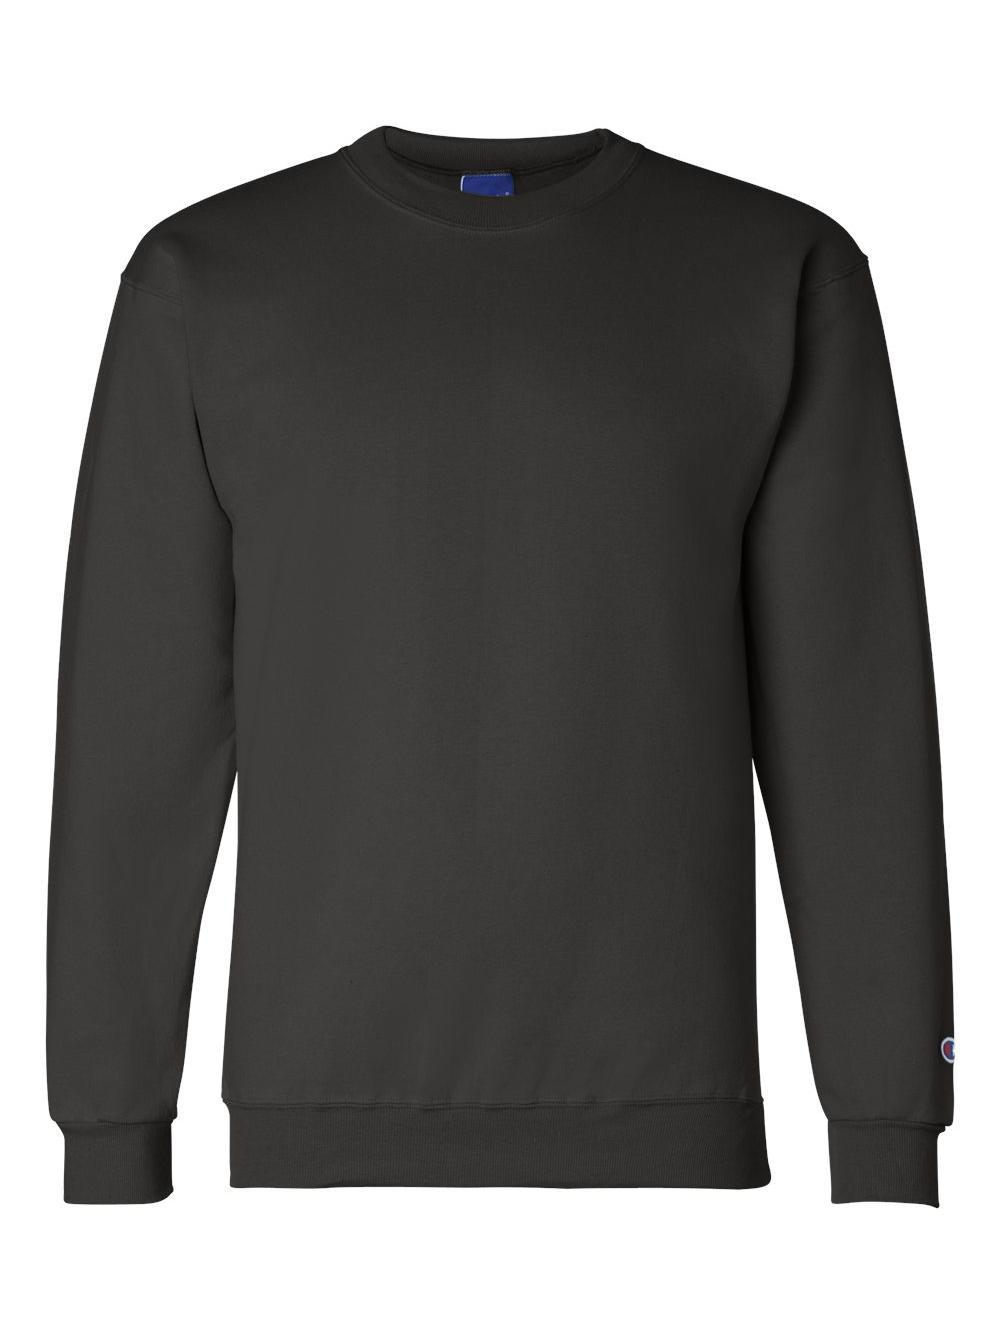 Champion-Double-Dry-Eco-Crewneck-Sweatshirt-S600 thumbnail 3